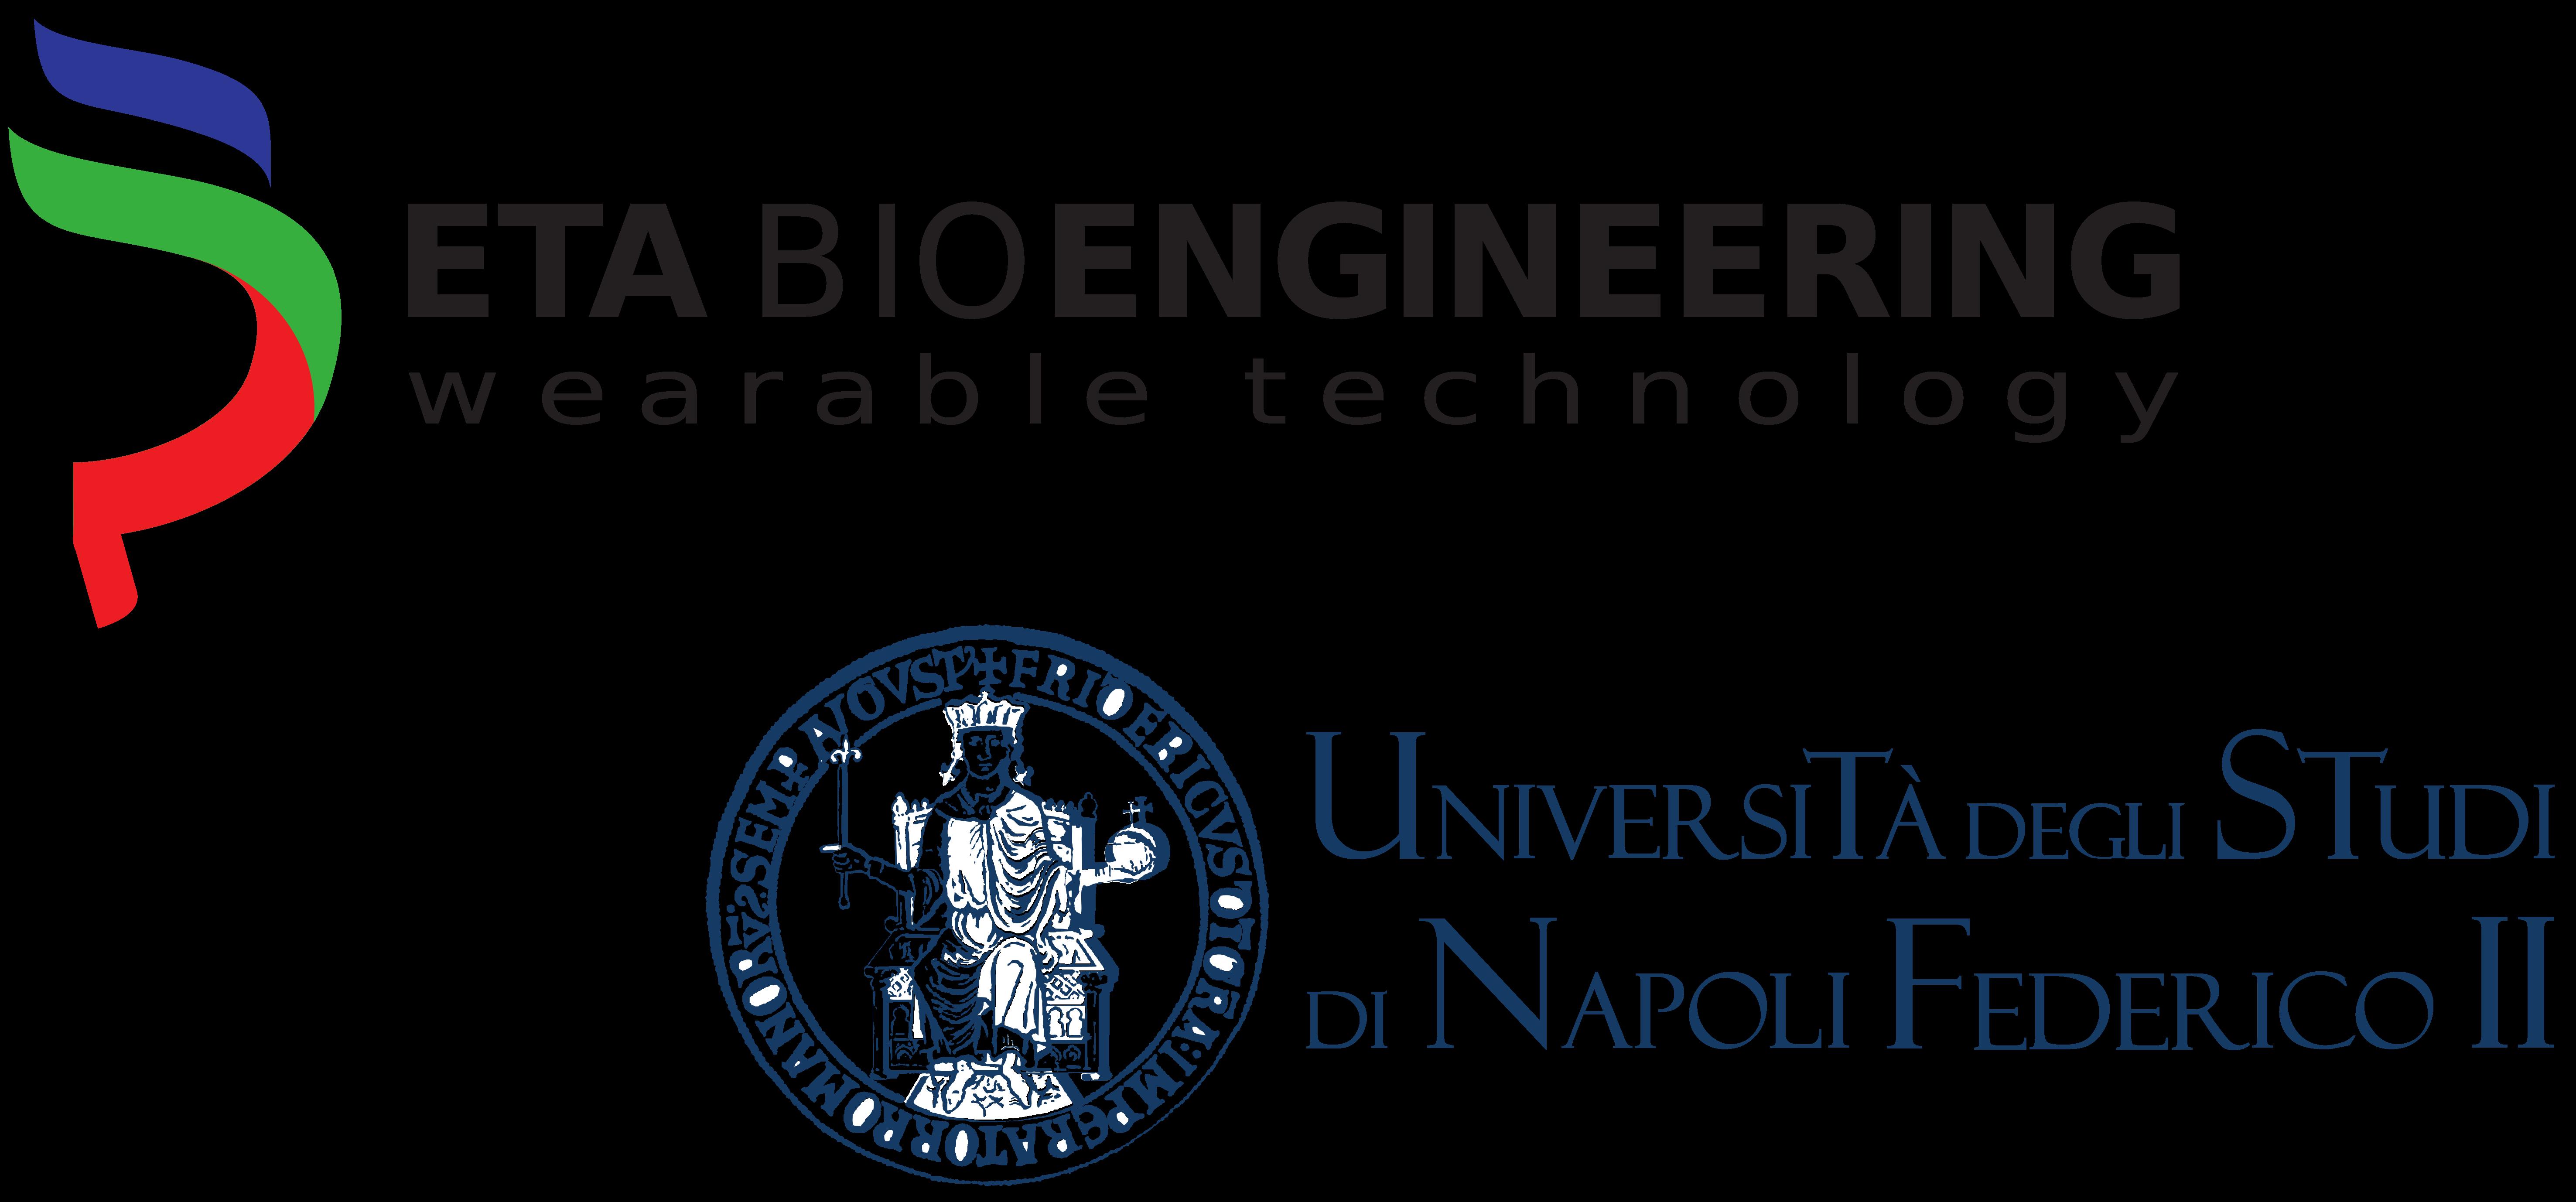 ETA Bioengineering is a Spin-Off Company of University of Naples Federico II